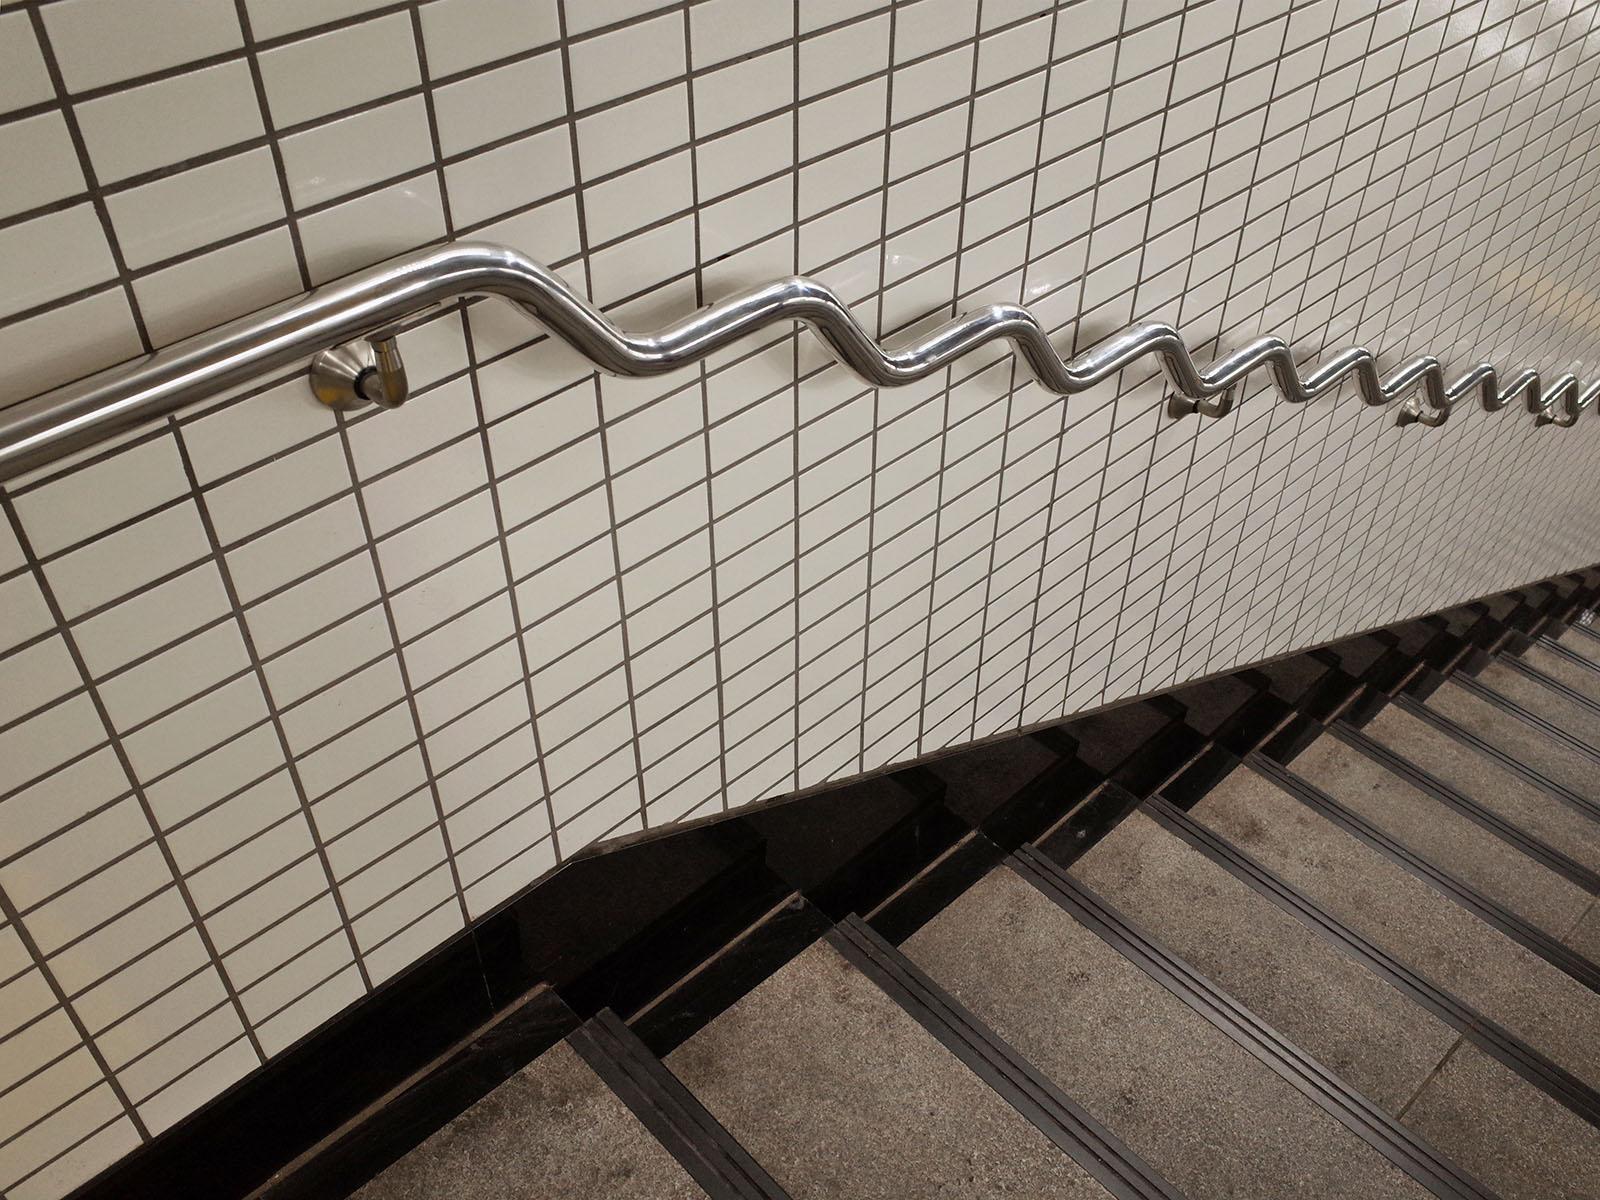 harajuku rampe